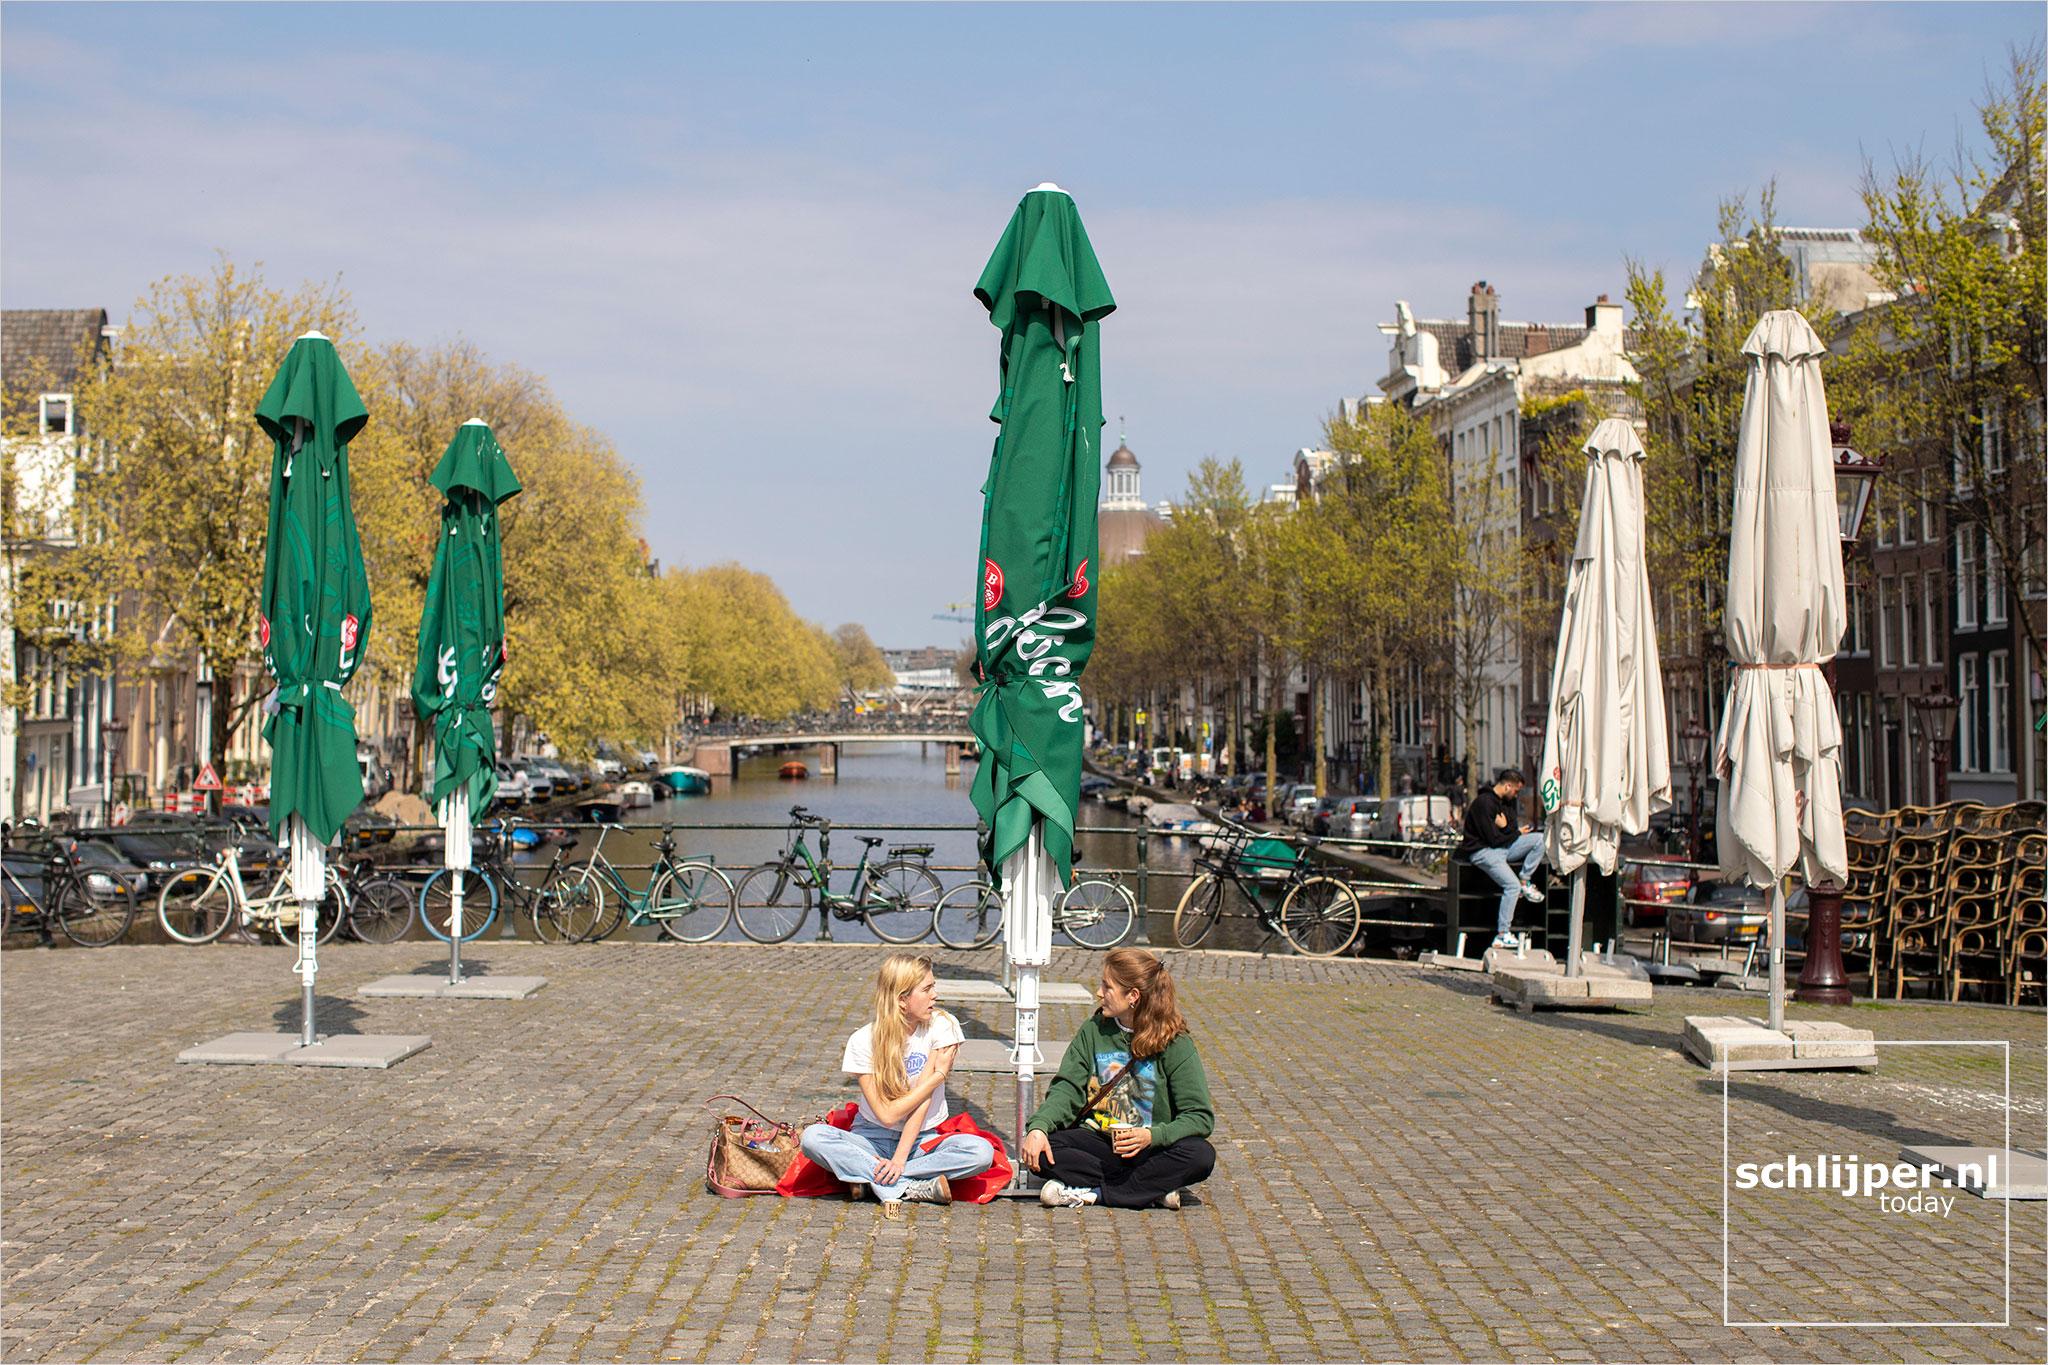 The Netherlands, Amsterdam, 20 april 2021